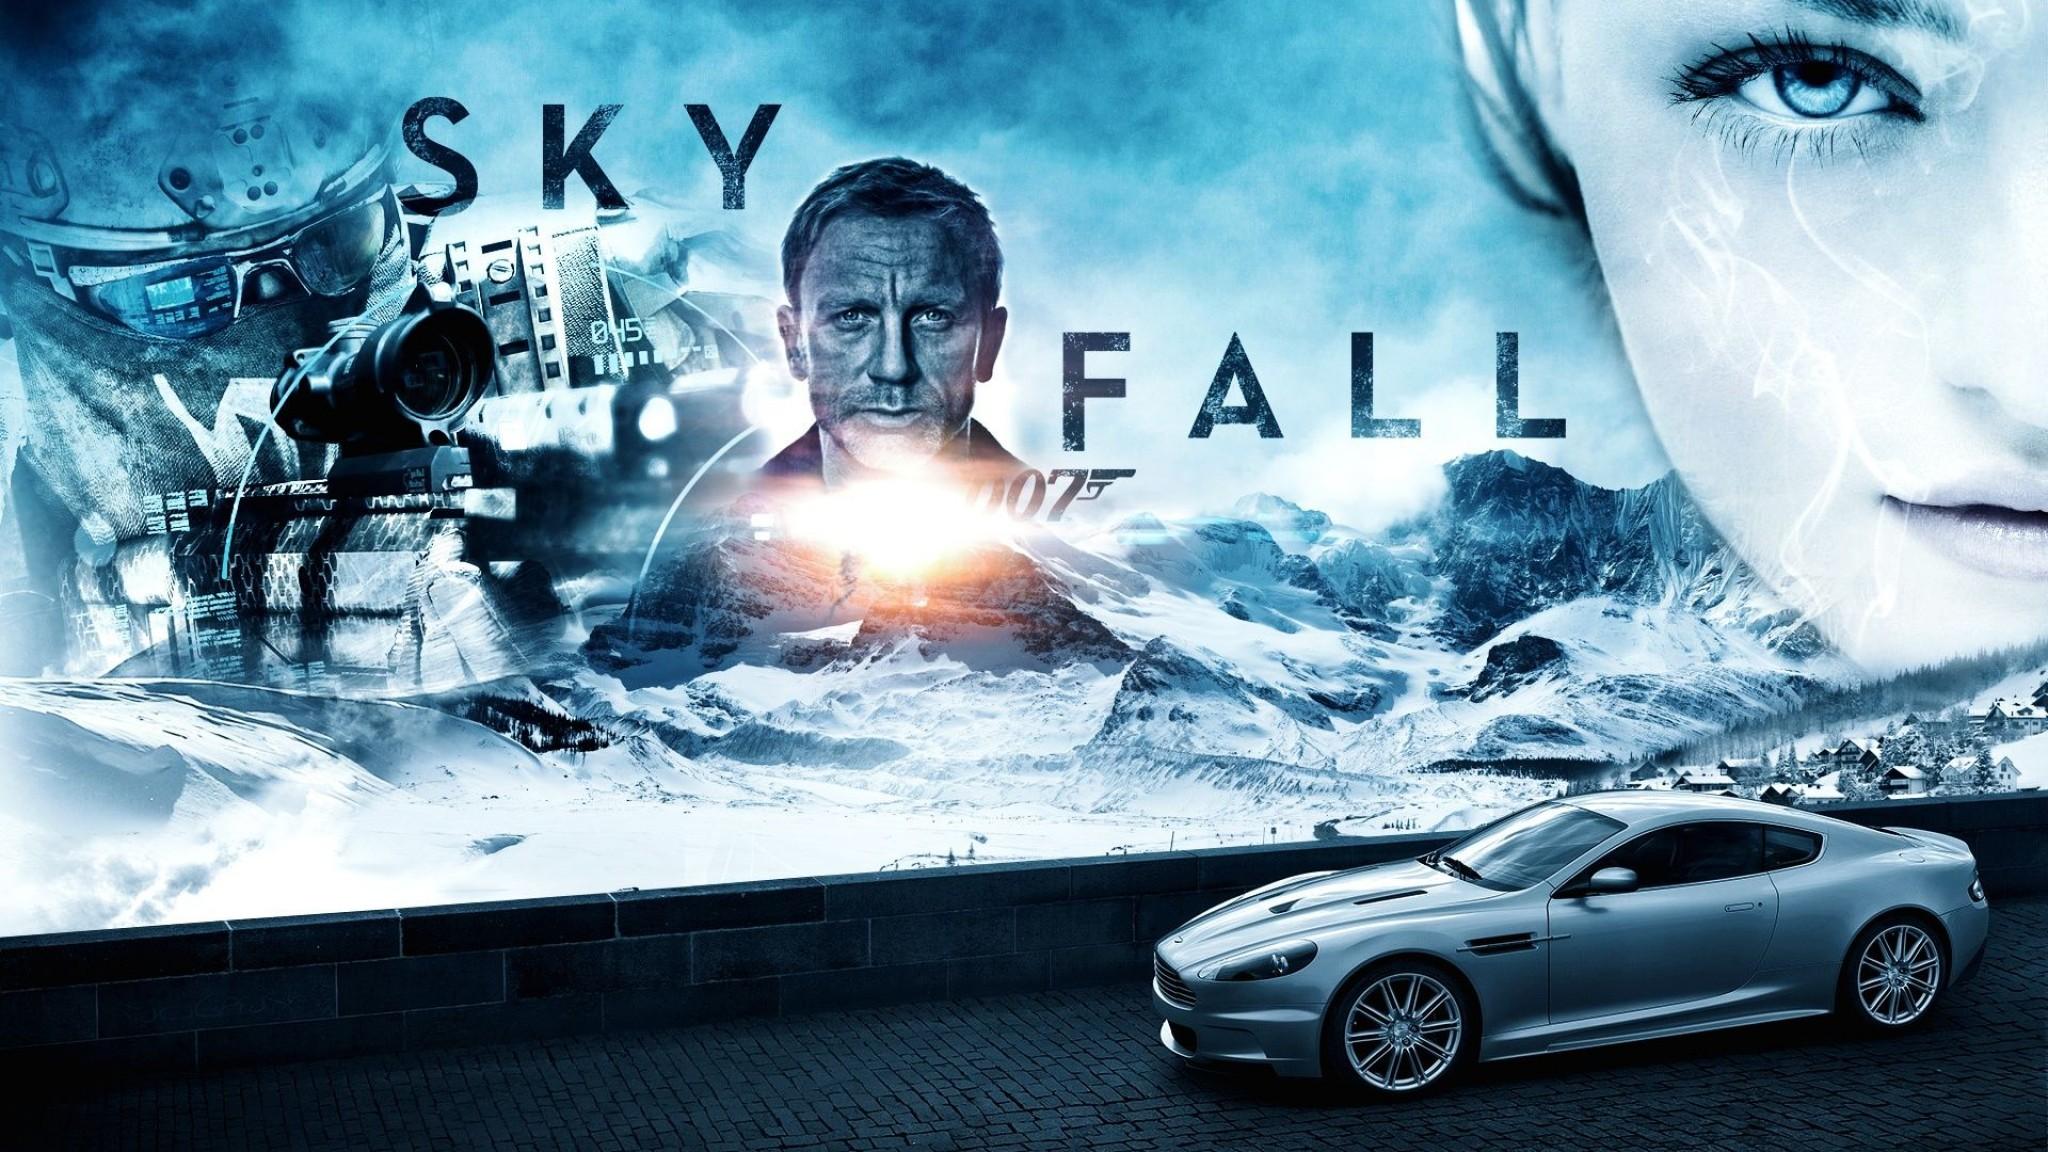 James Bond 007 Wallpaper  The James Bond 007 Dossier